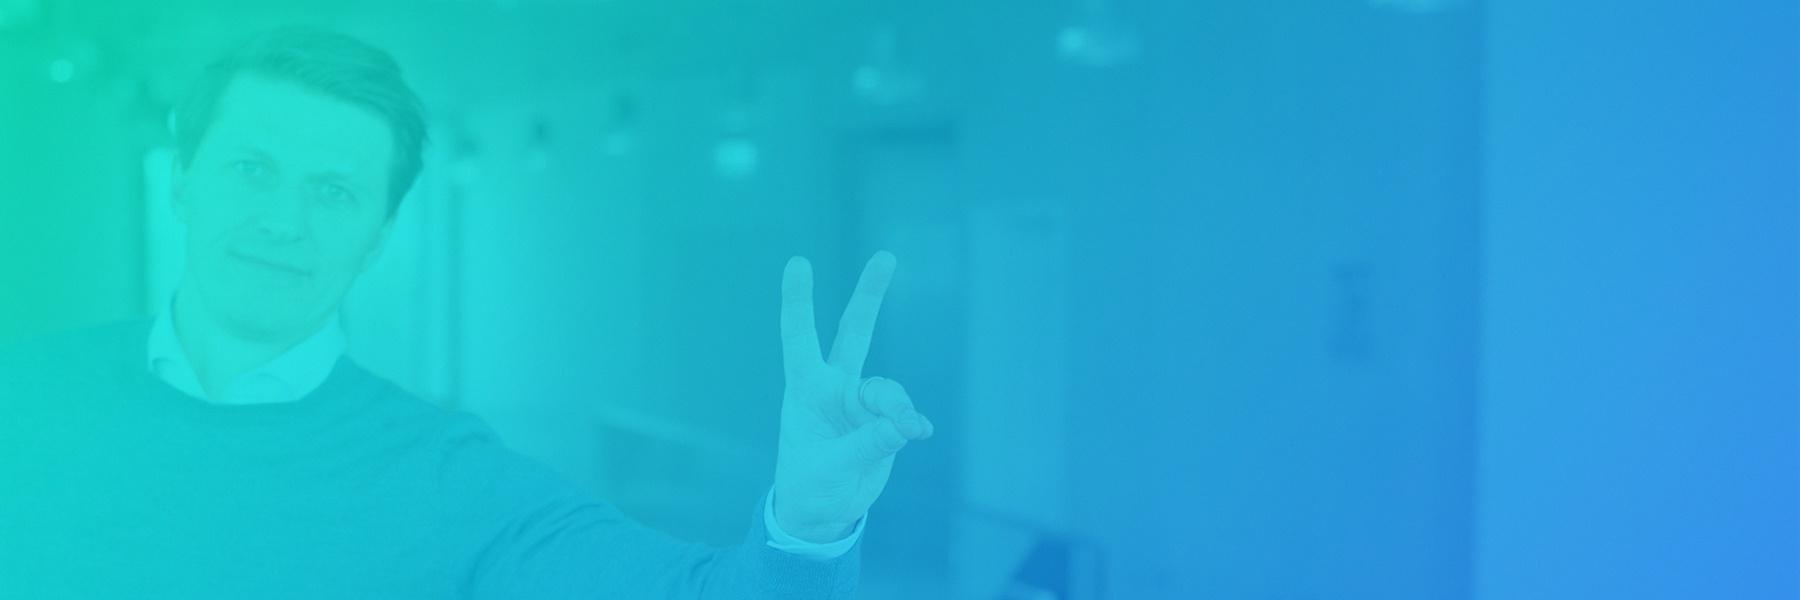 Basecamp-Salesforce-Landingpage-header-1800x600-copy.jpg